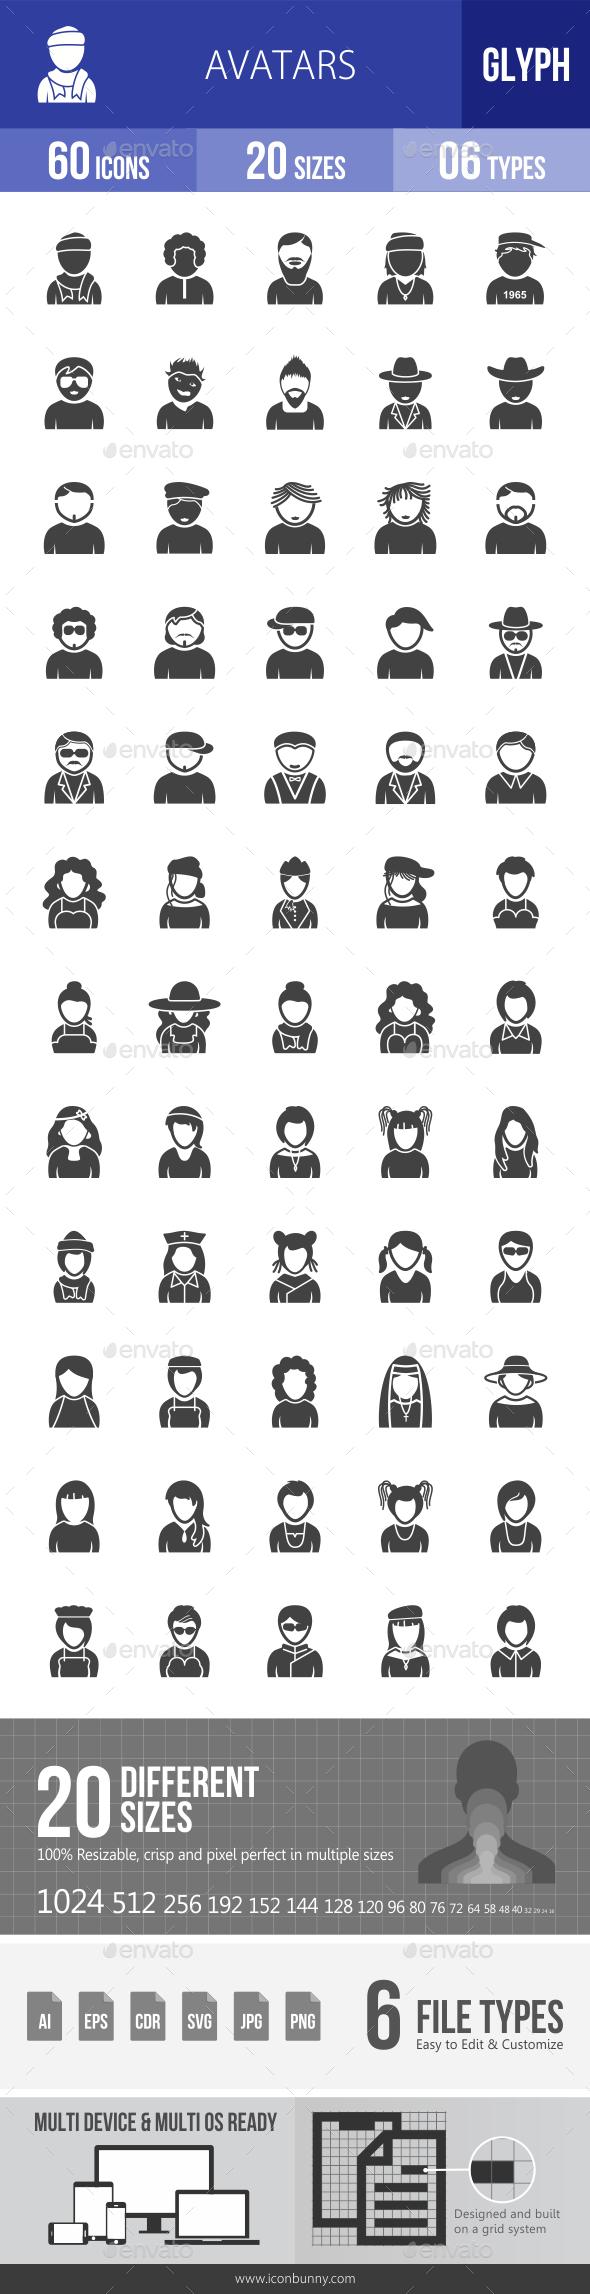 Avatars Glyph Icons - Icons